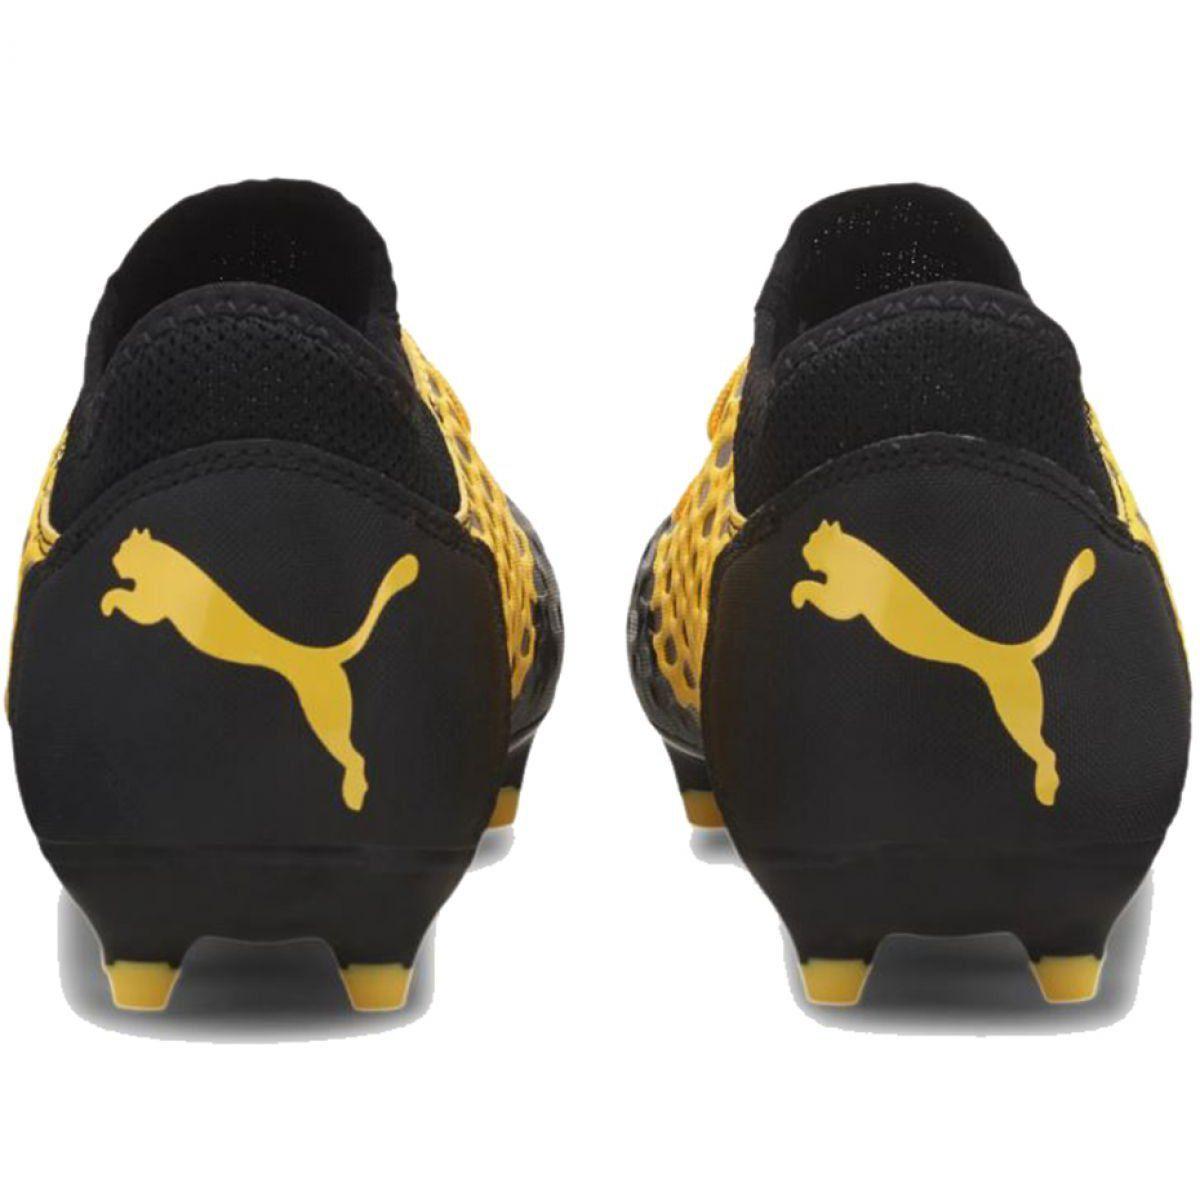 Buty Pilkarskie Puma Future 5 4 Fg Ag Jr 105810 03 Zolte Zolte Baby Shoes Puma Vibram Sneaker